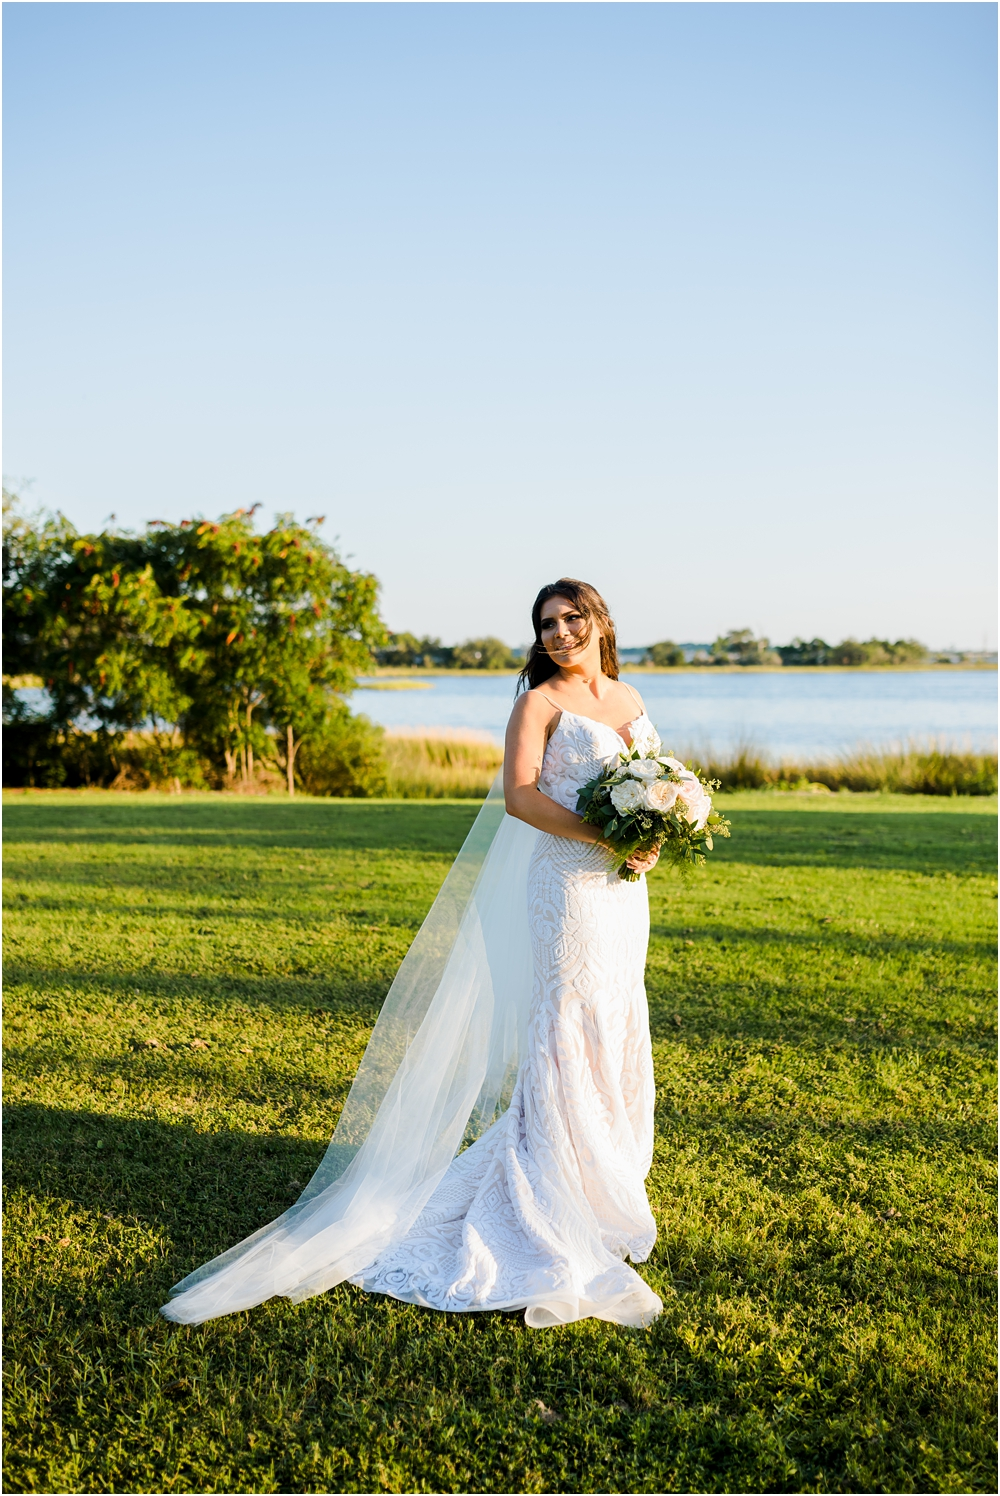 amack-wedding-kiersten-stevenson-photography-30a-panama-city-beach-dothan-tallahassee-(429-of-882).JPG